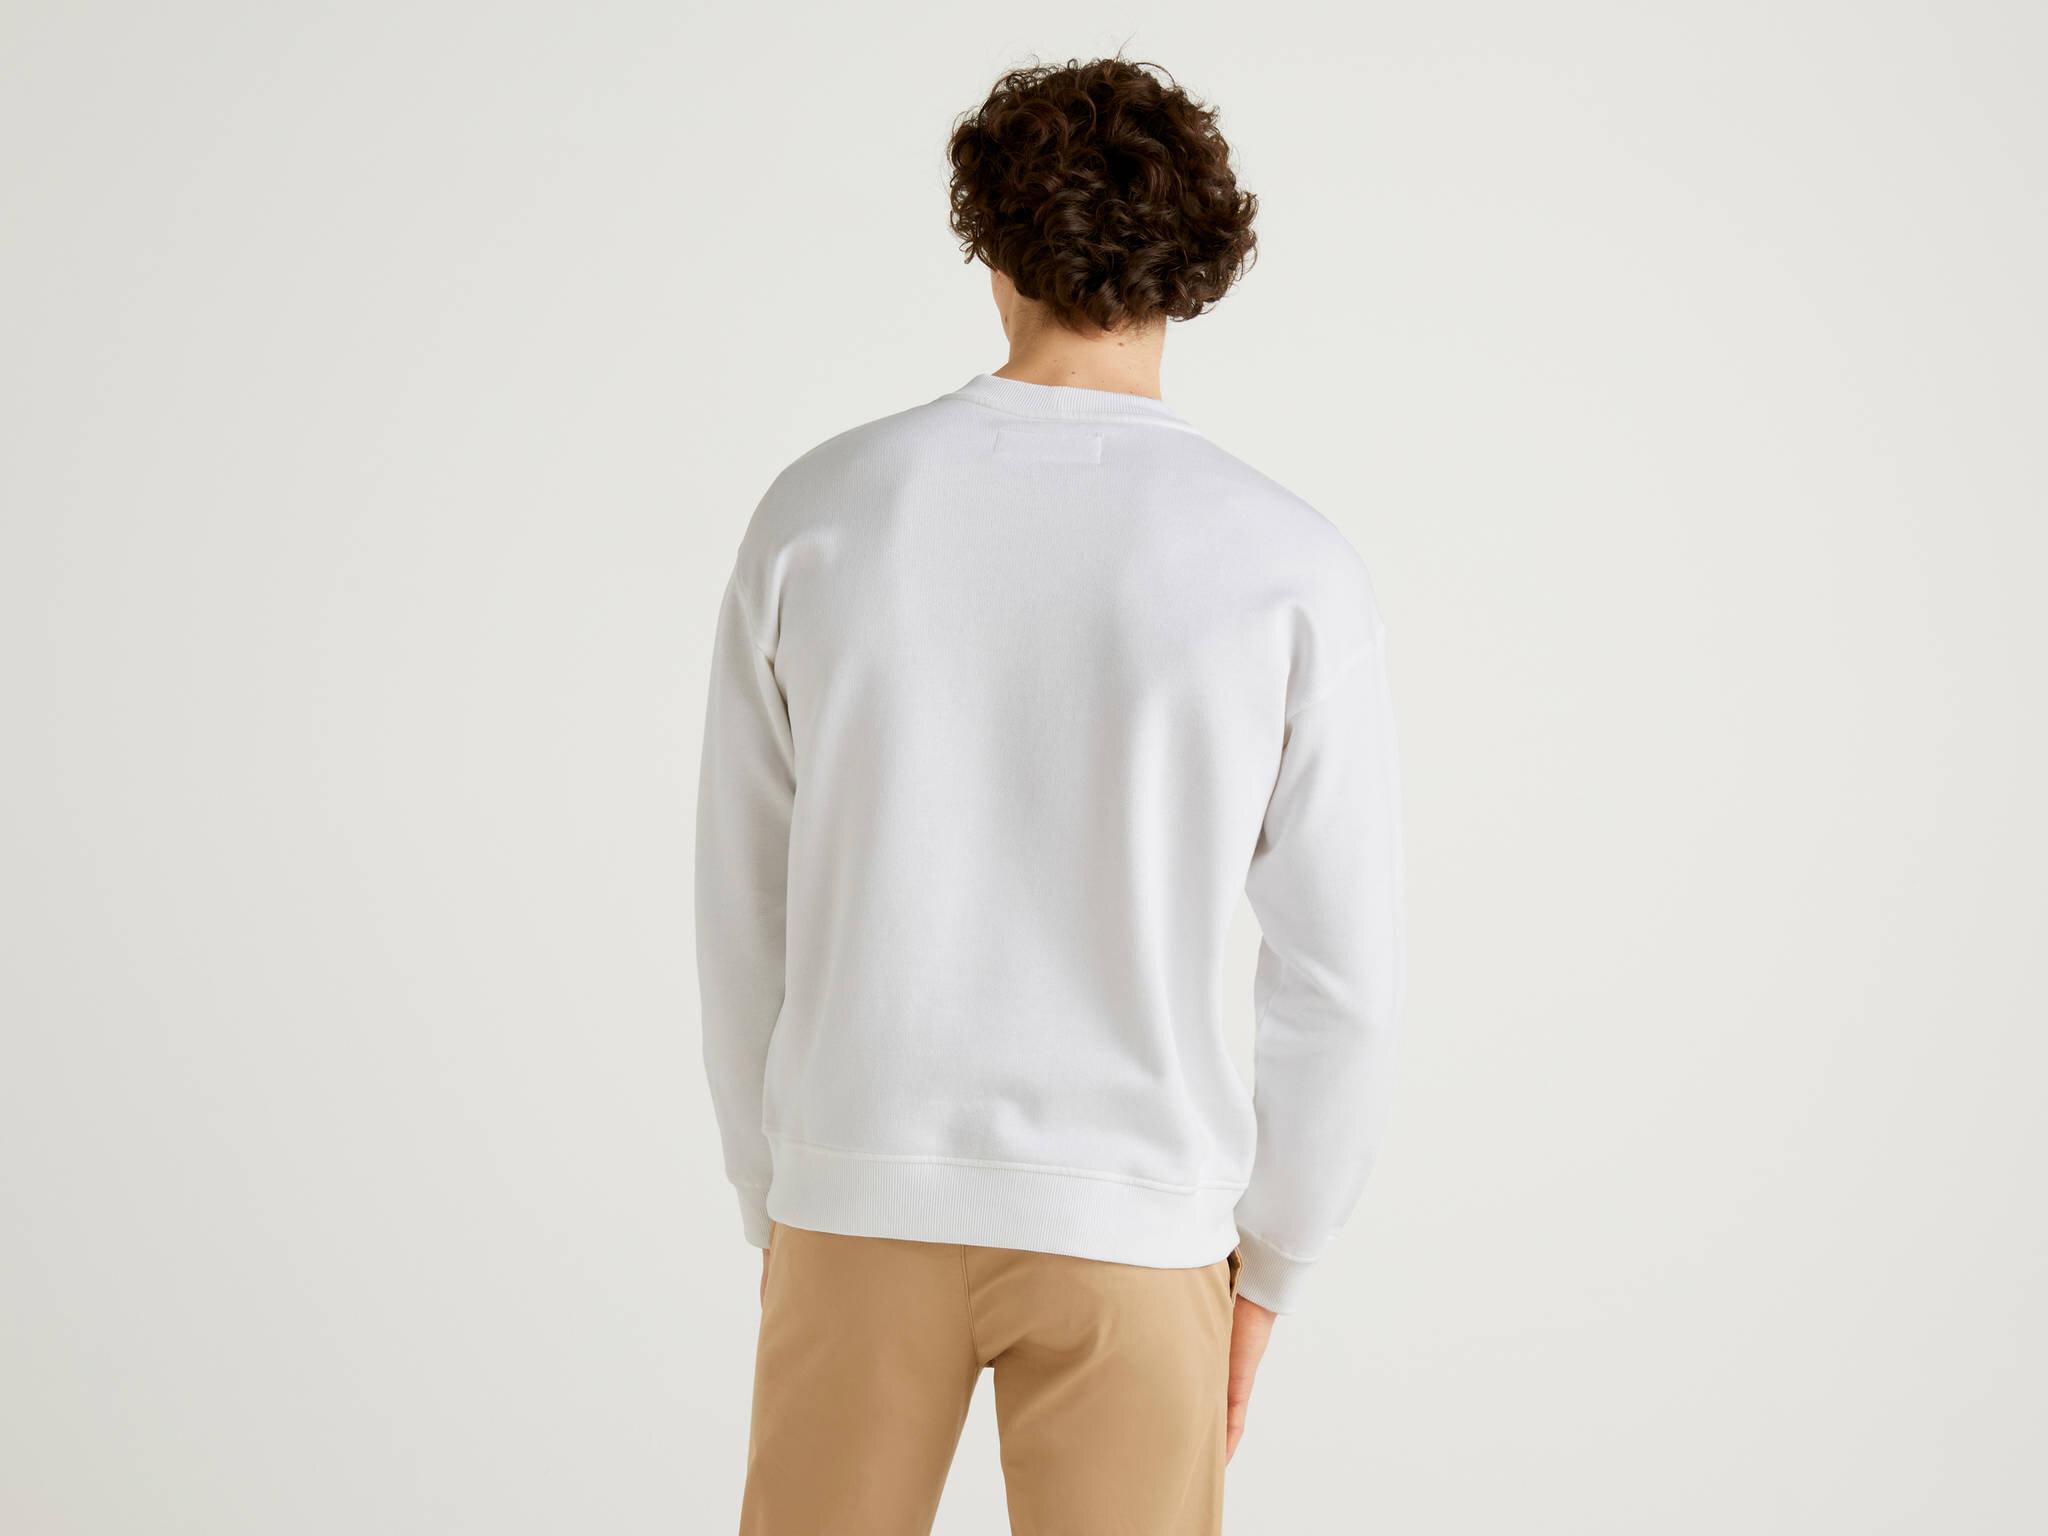 Basic Logolu Sweatshirt